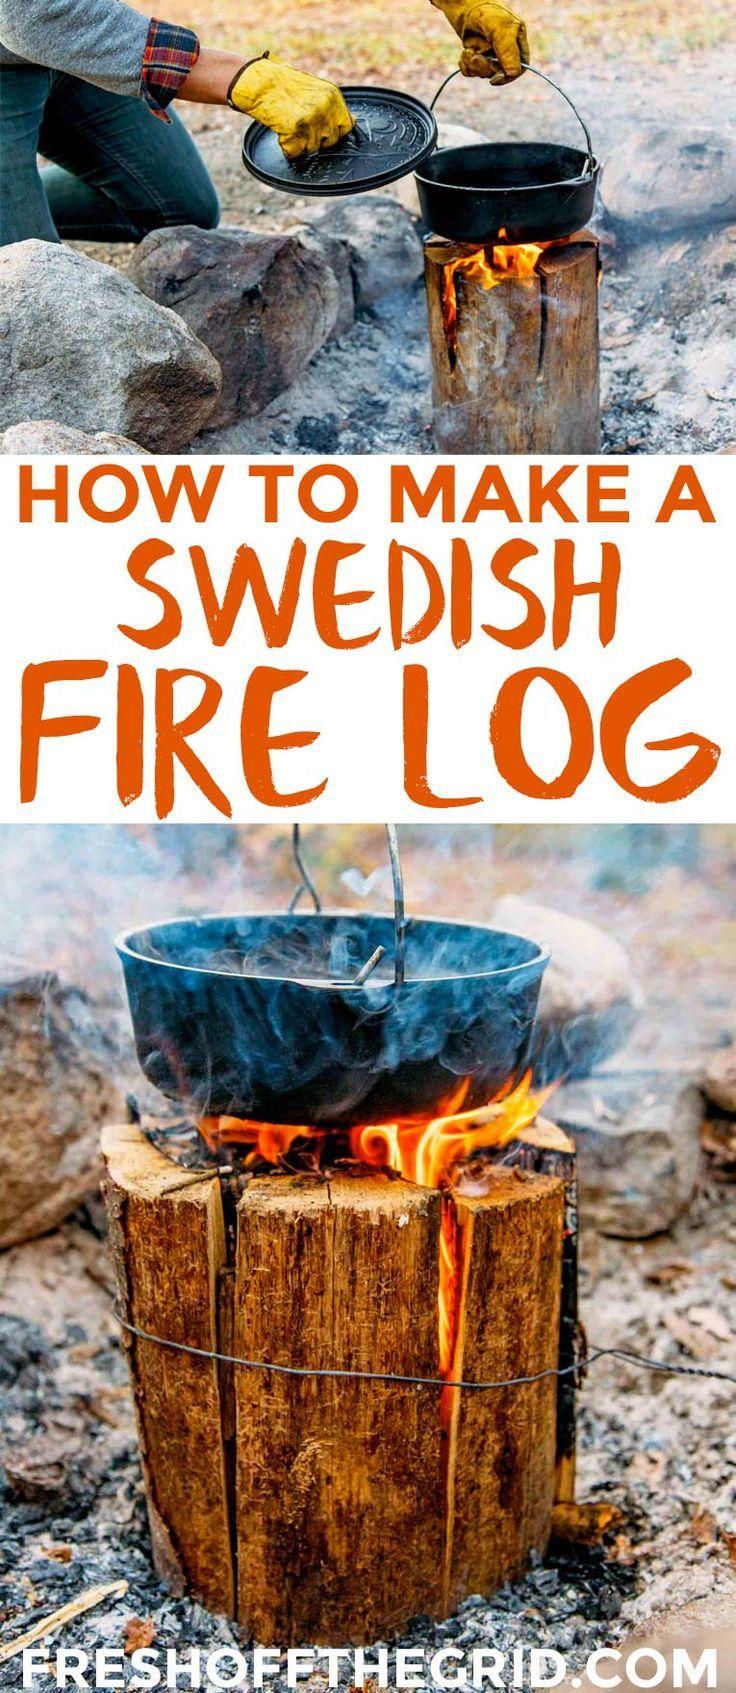 How to Make a Swedish Fire Log  f7bbb4b36